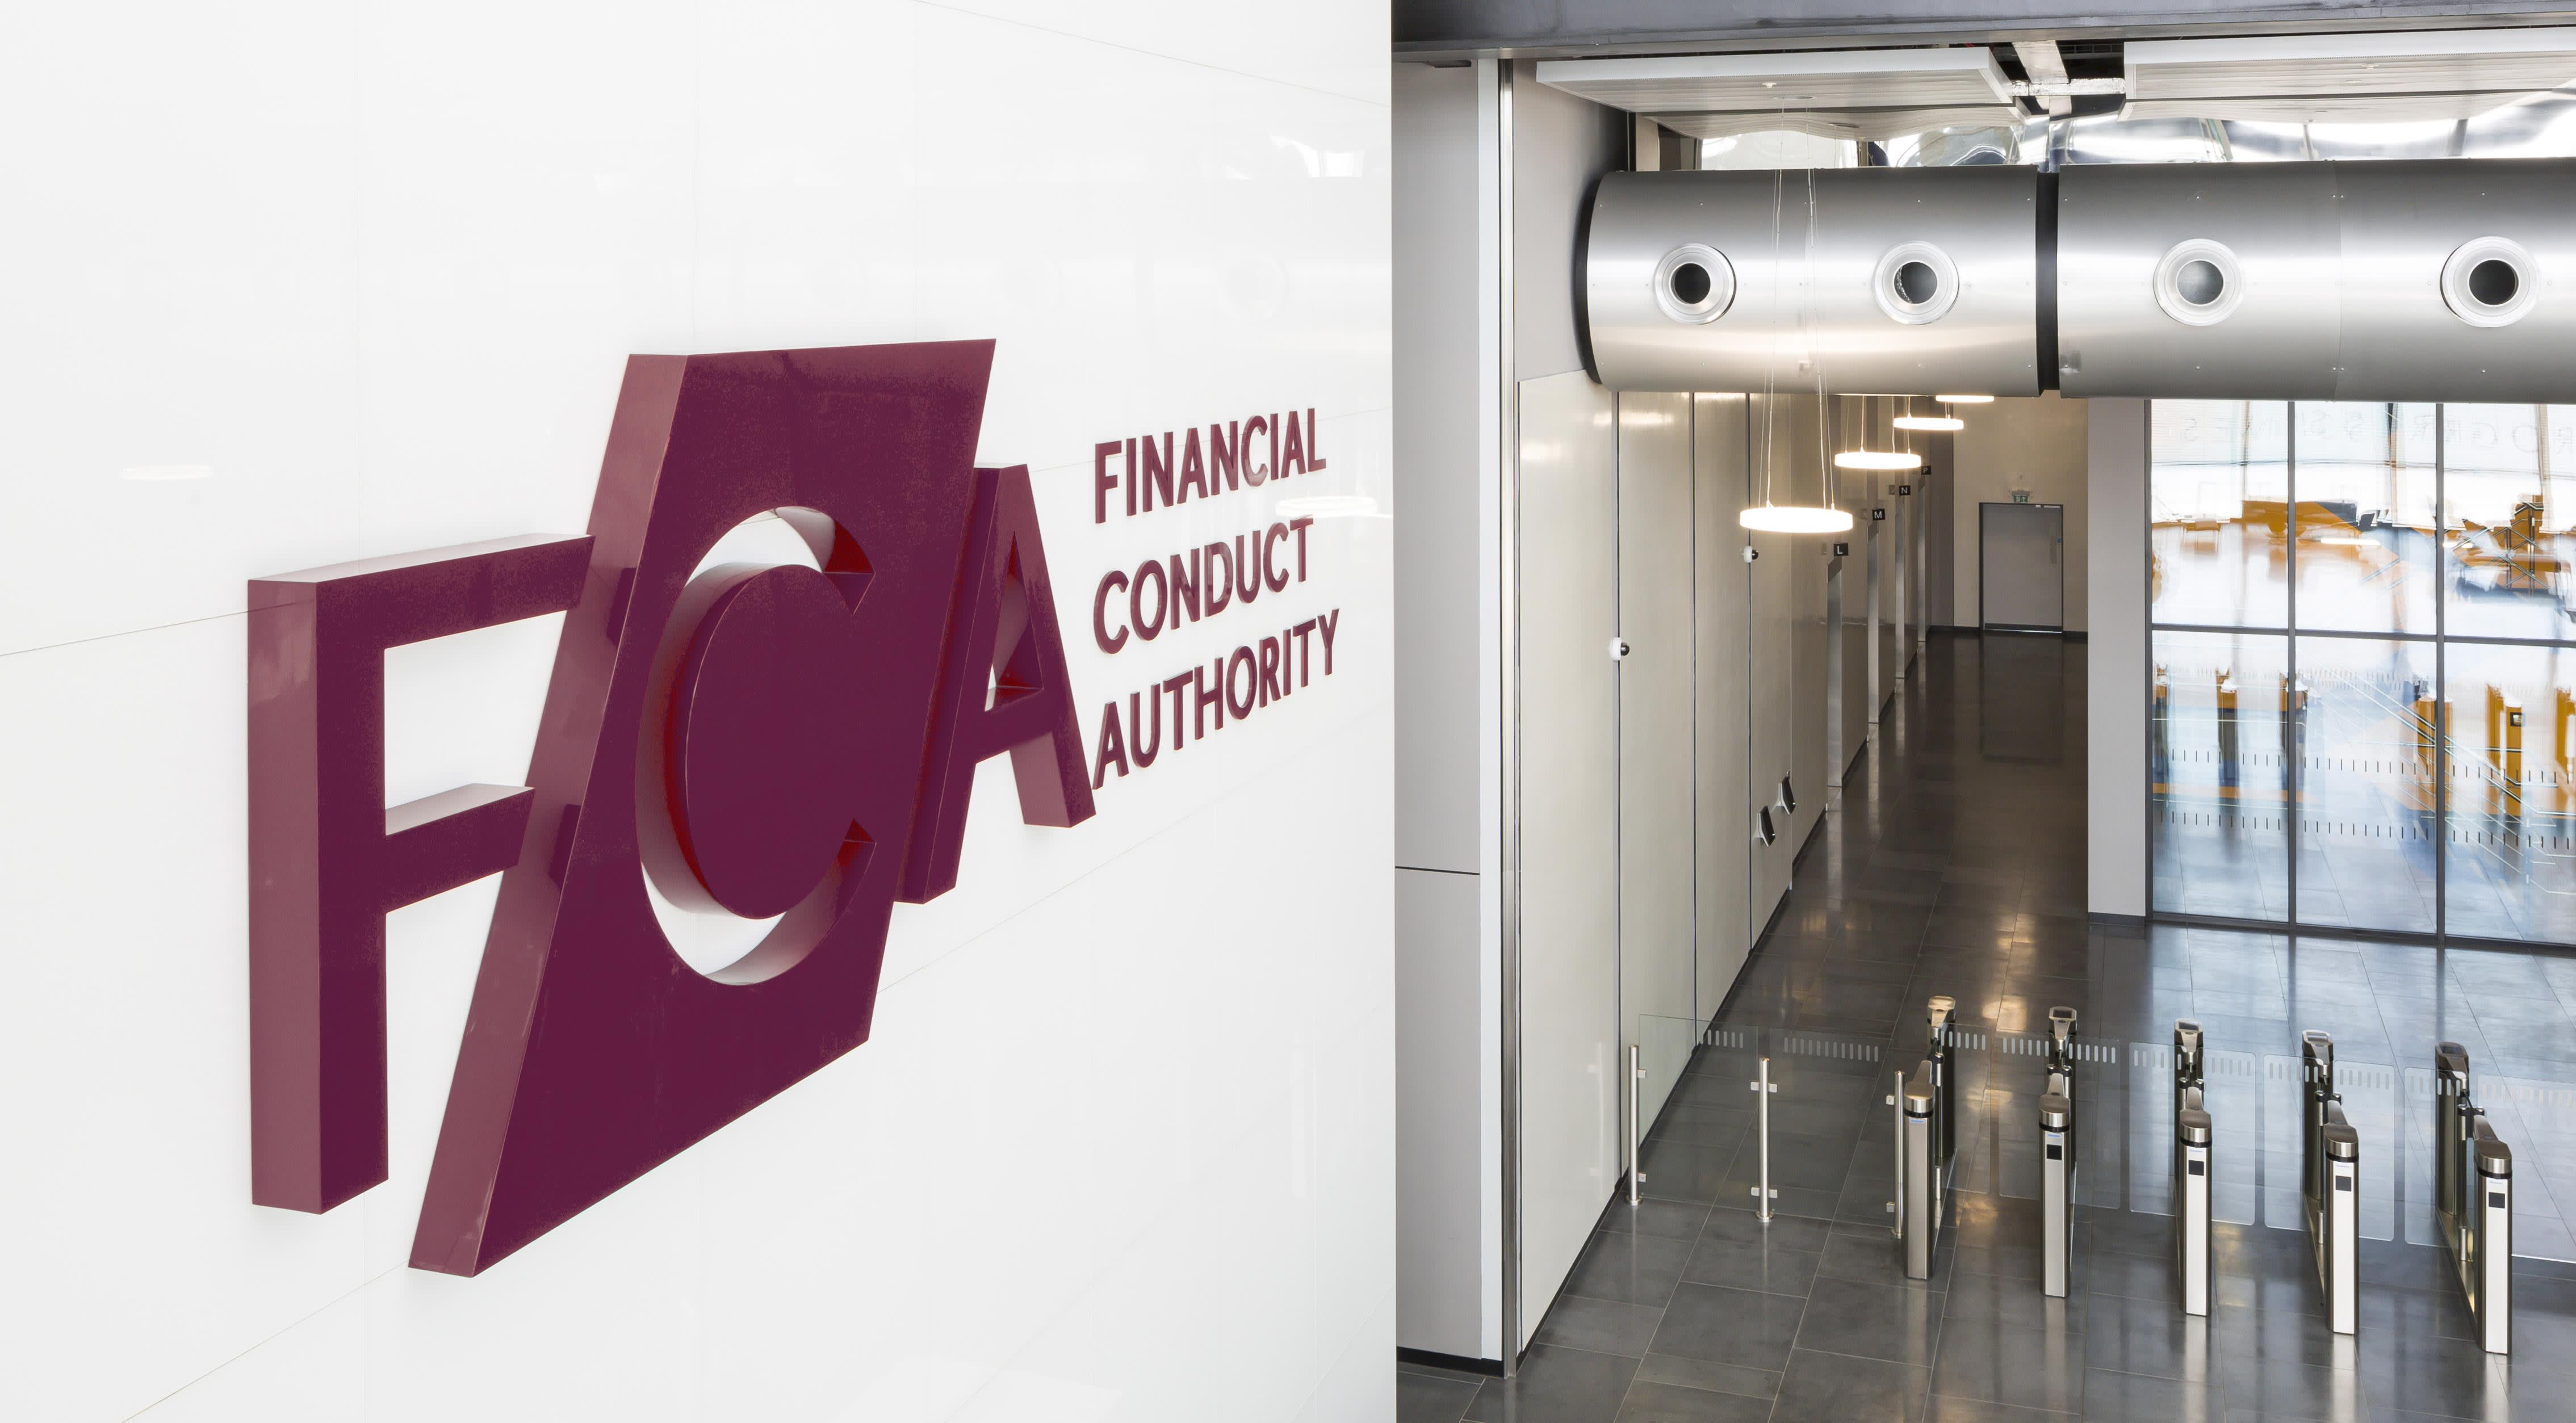 FCA and adviser in £200k authorisation spat